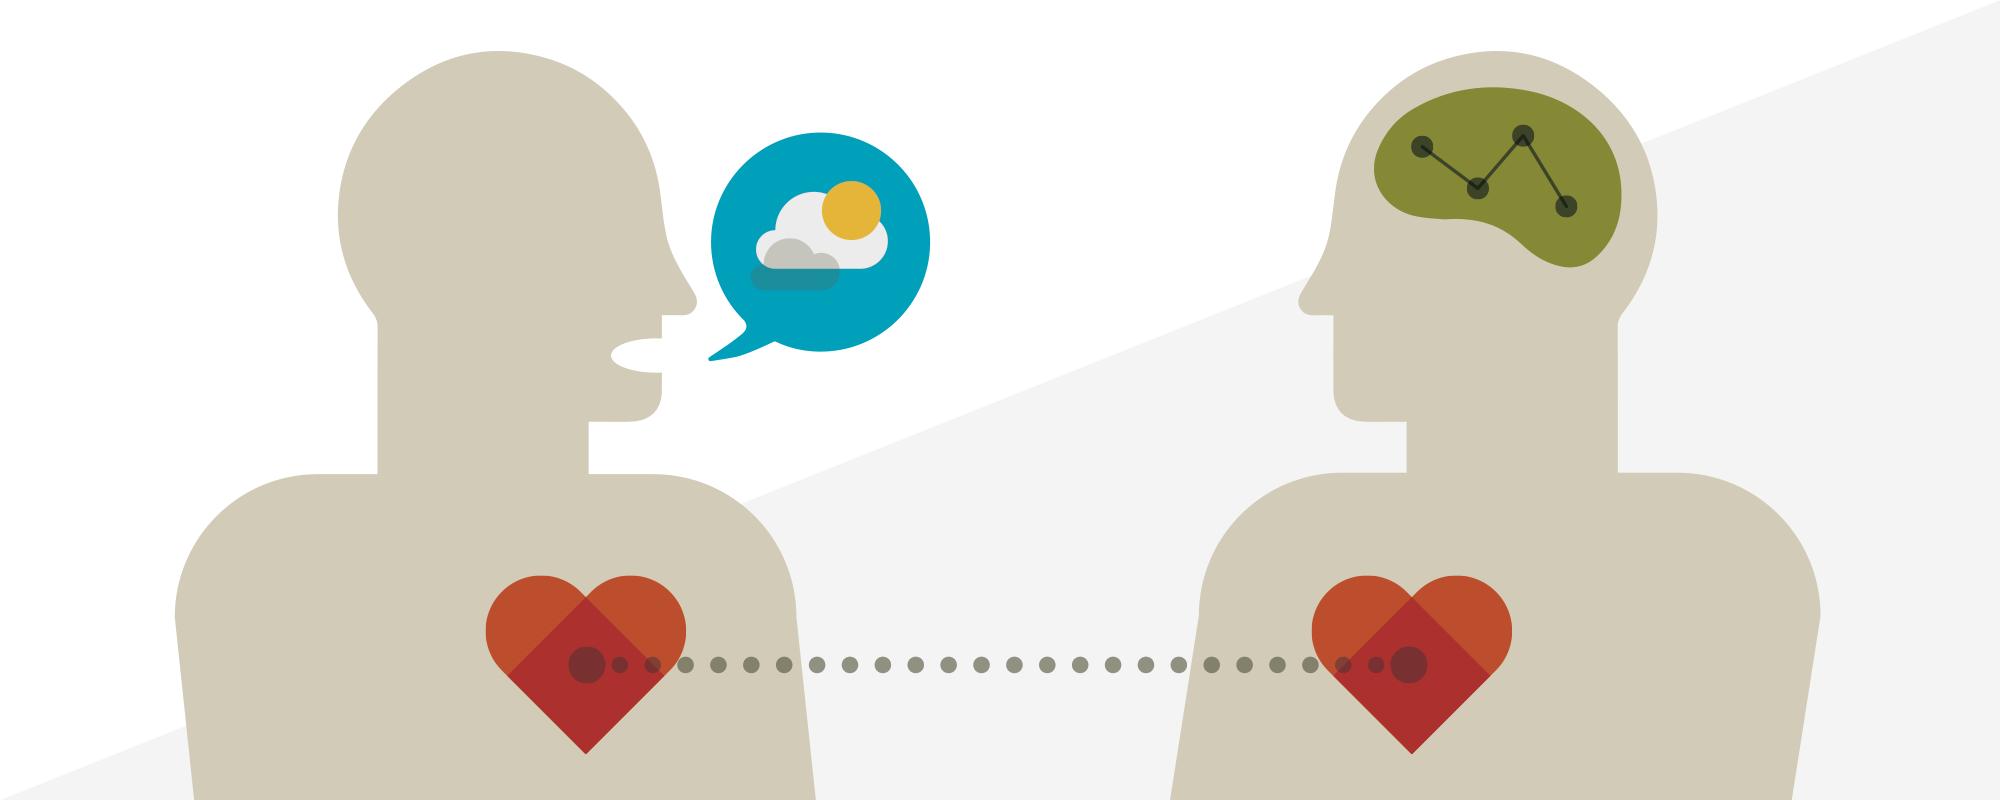 use storytelling in marketing to create empathy